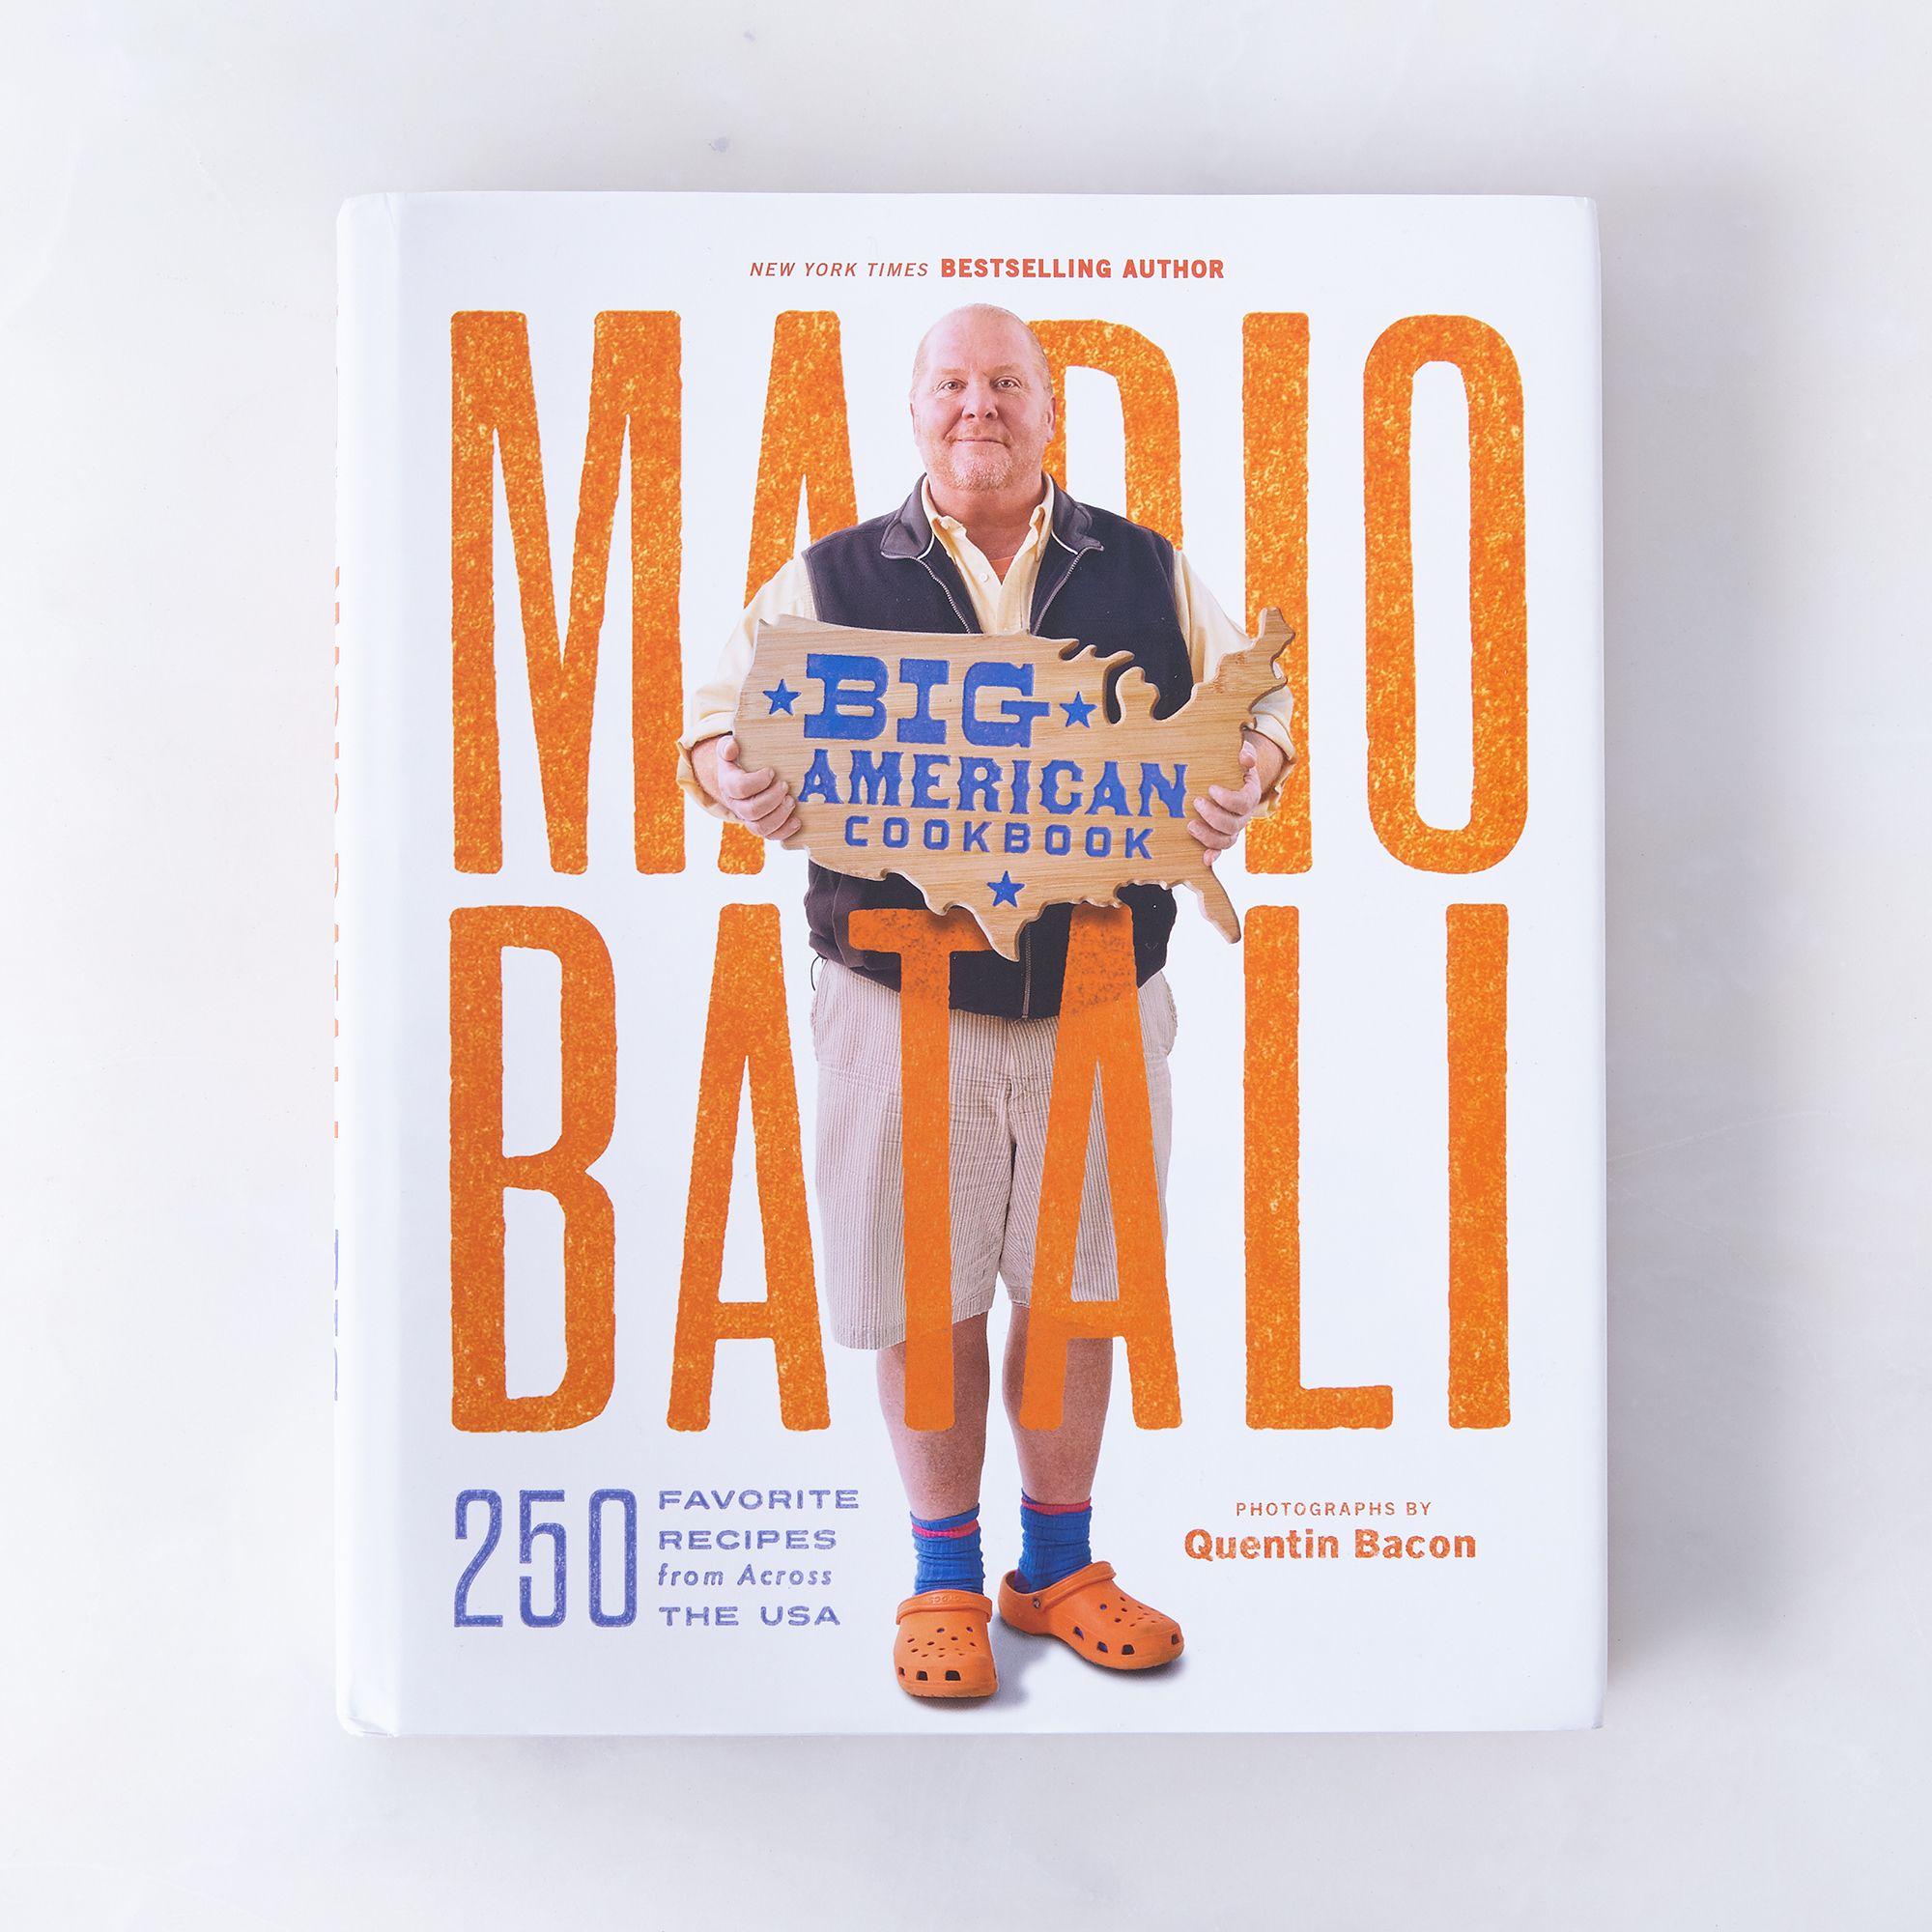 61a2bb28 22f1 44f9 868f 506fc9efef3b  2016 0916 hachette big american cookbook by mario batali silo rocky luten 159 1